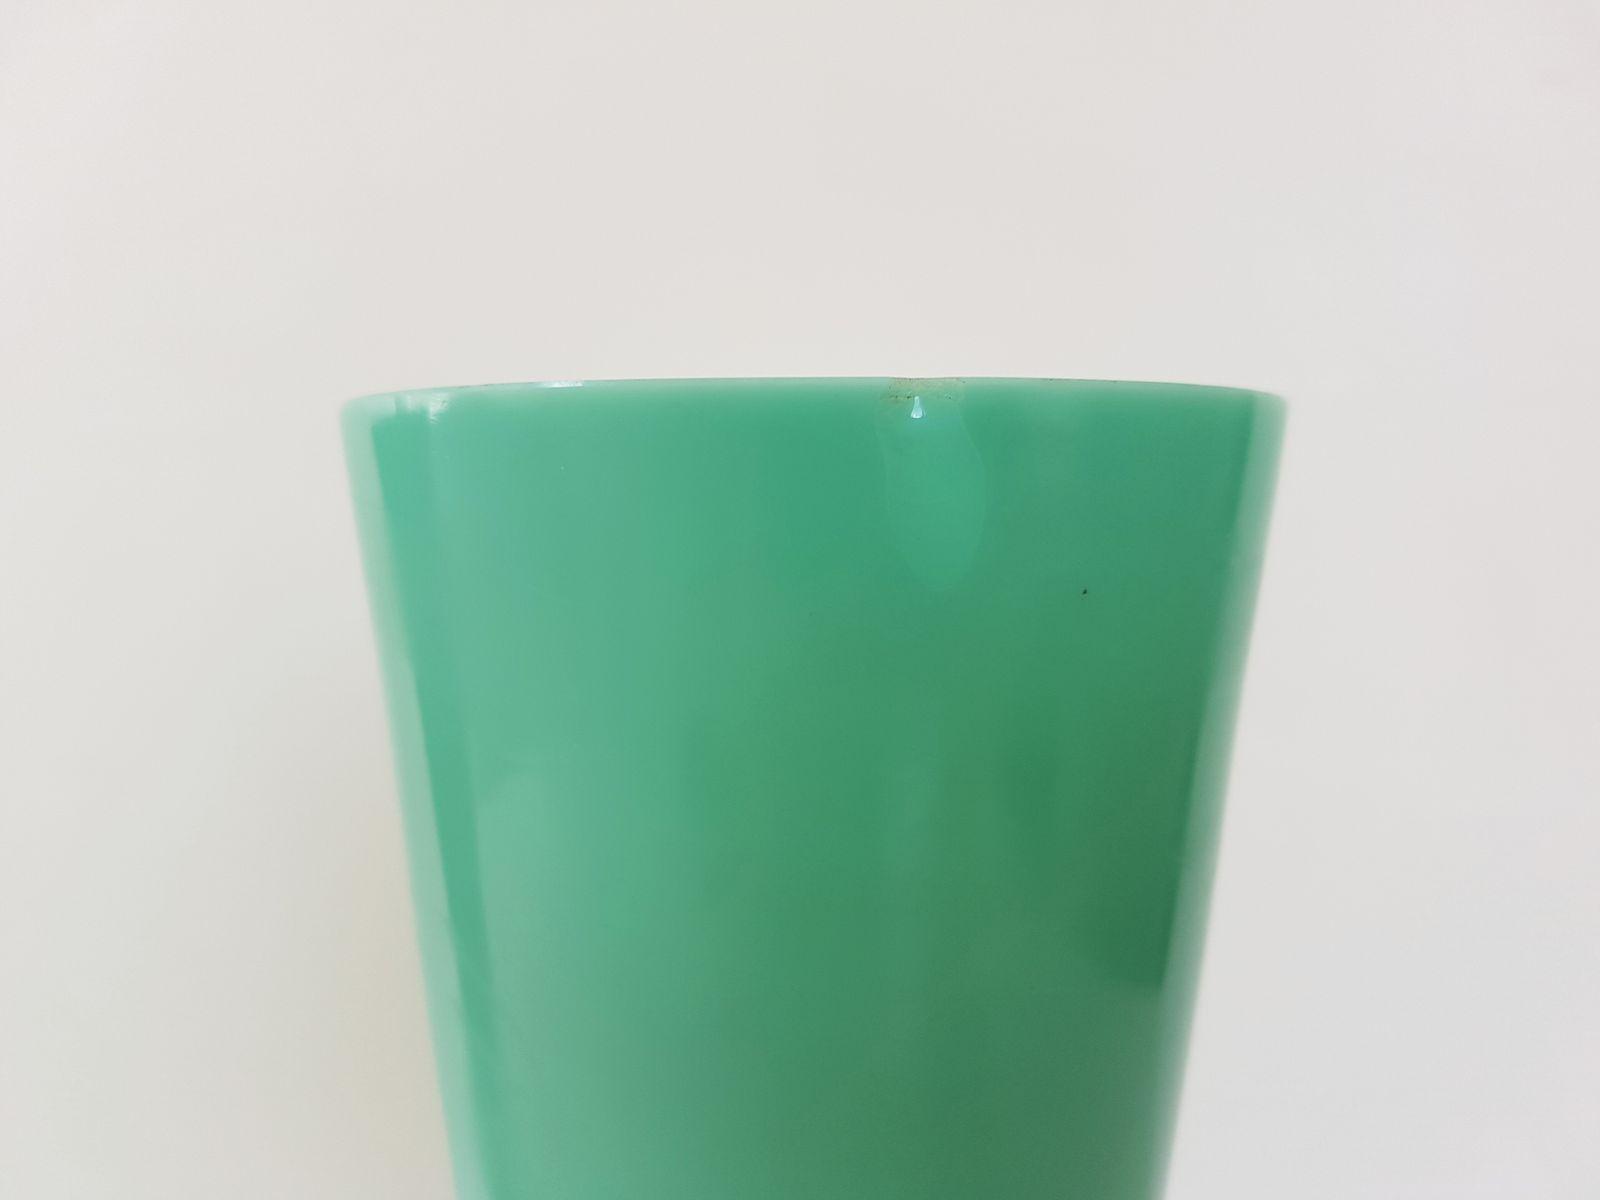 Art deco black green opaline glass vases 1920s set of 2 for price per set reviewsmspy